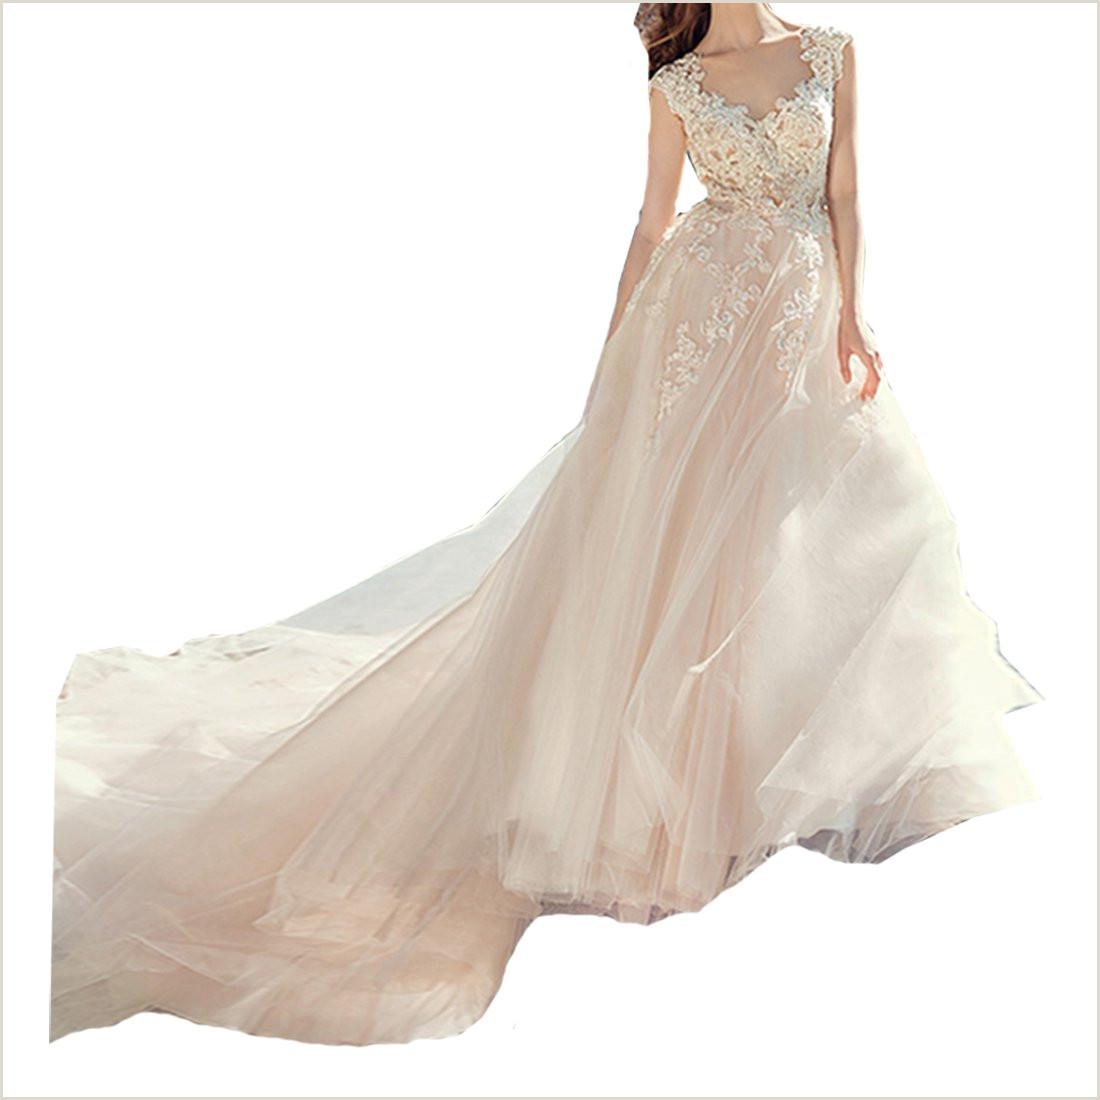 Wedding Dresses Joplin Mo the Most Beautiful Beach Wedding Dresses – Dacc